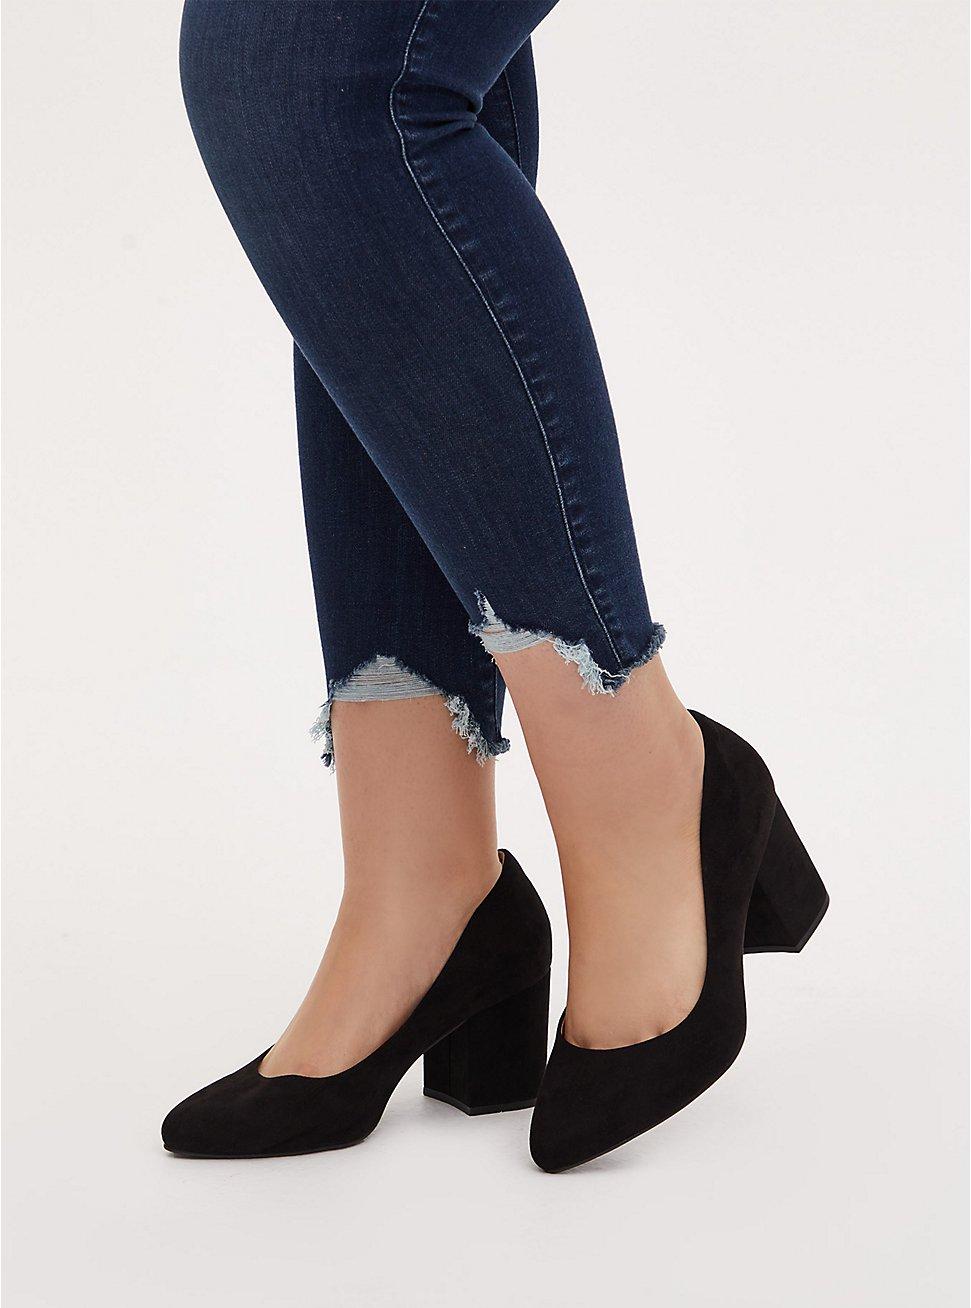 Black Faux Suede Pointed Toe Block Heel Pump (WW), BLACK, hi-res